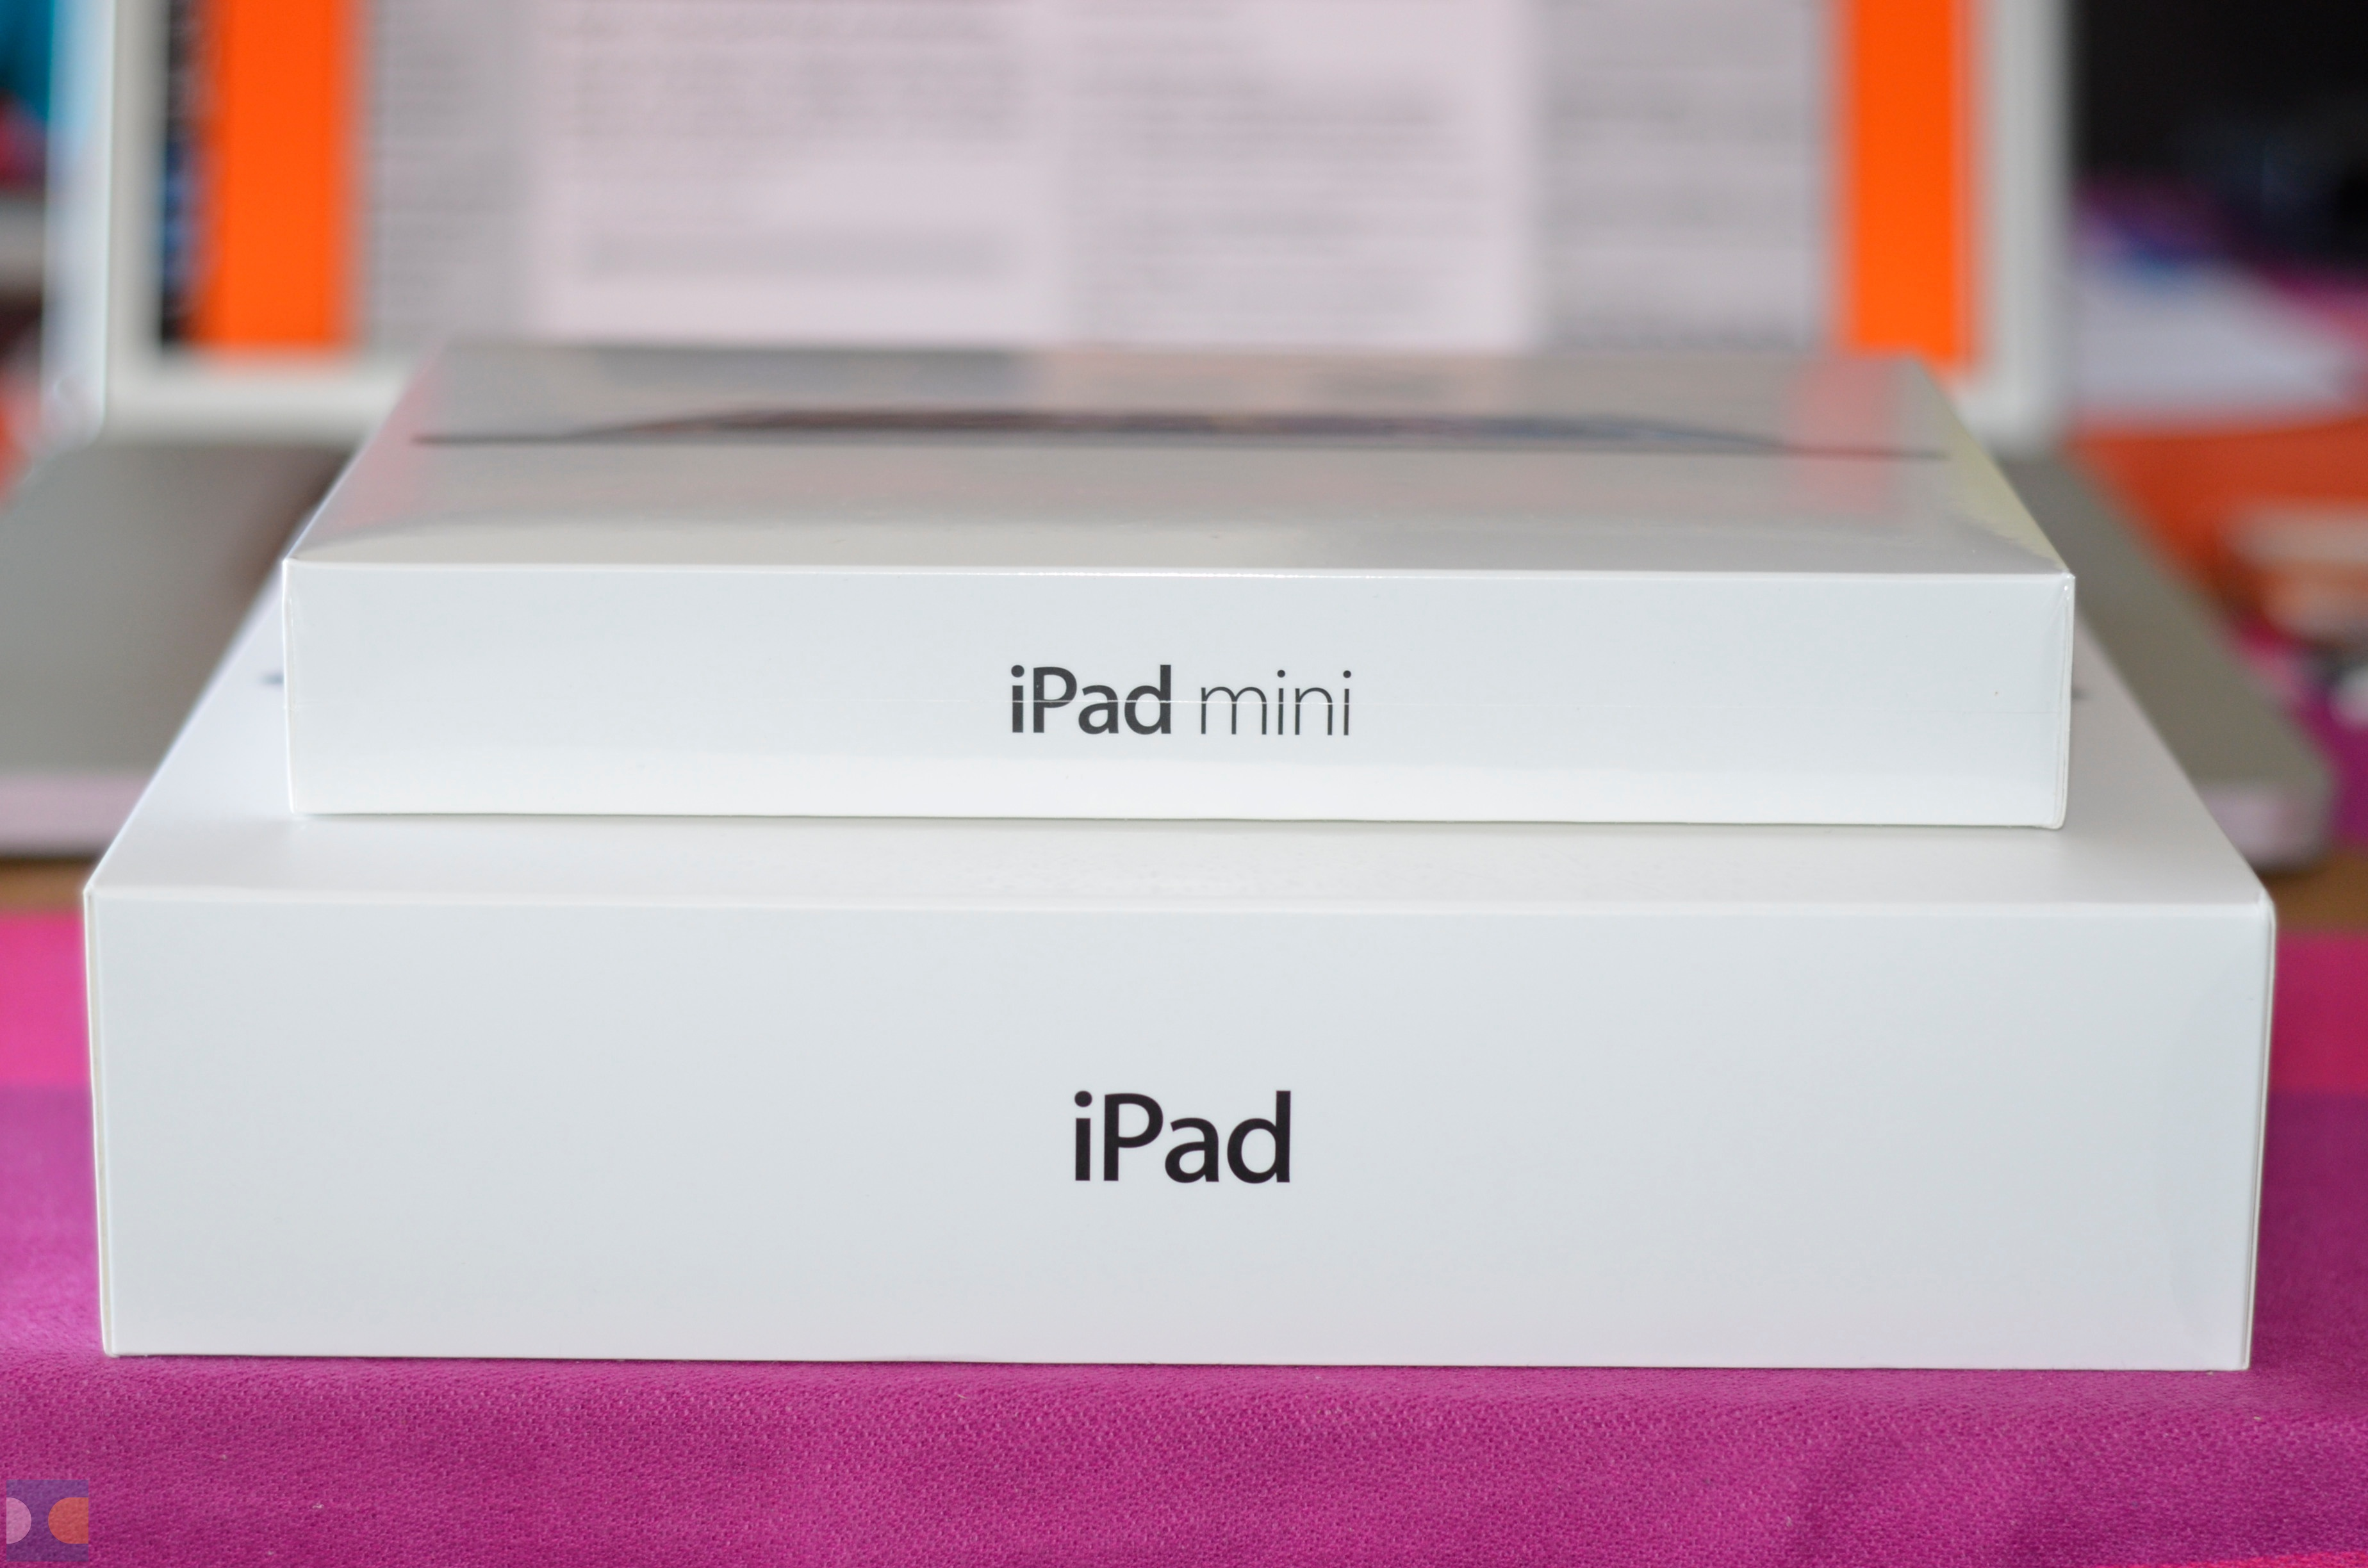 iPad mini entregue antes da hora